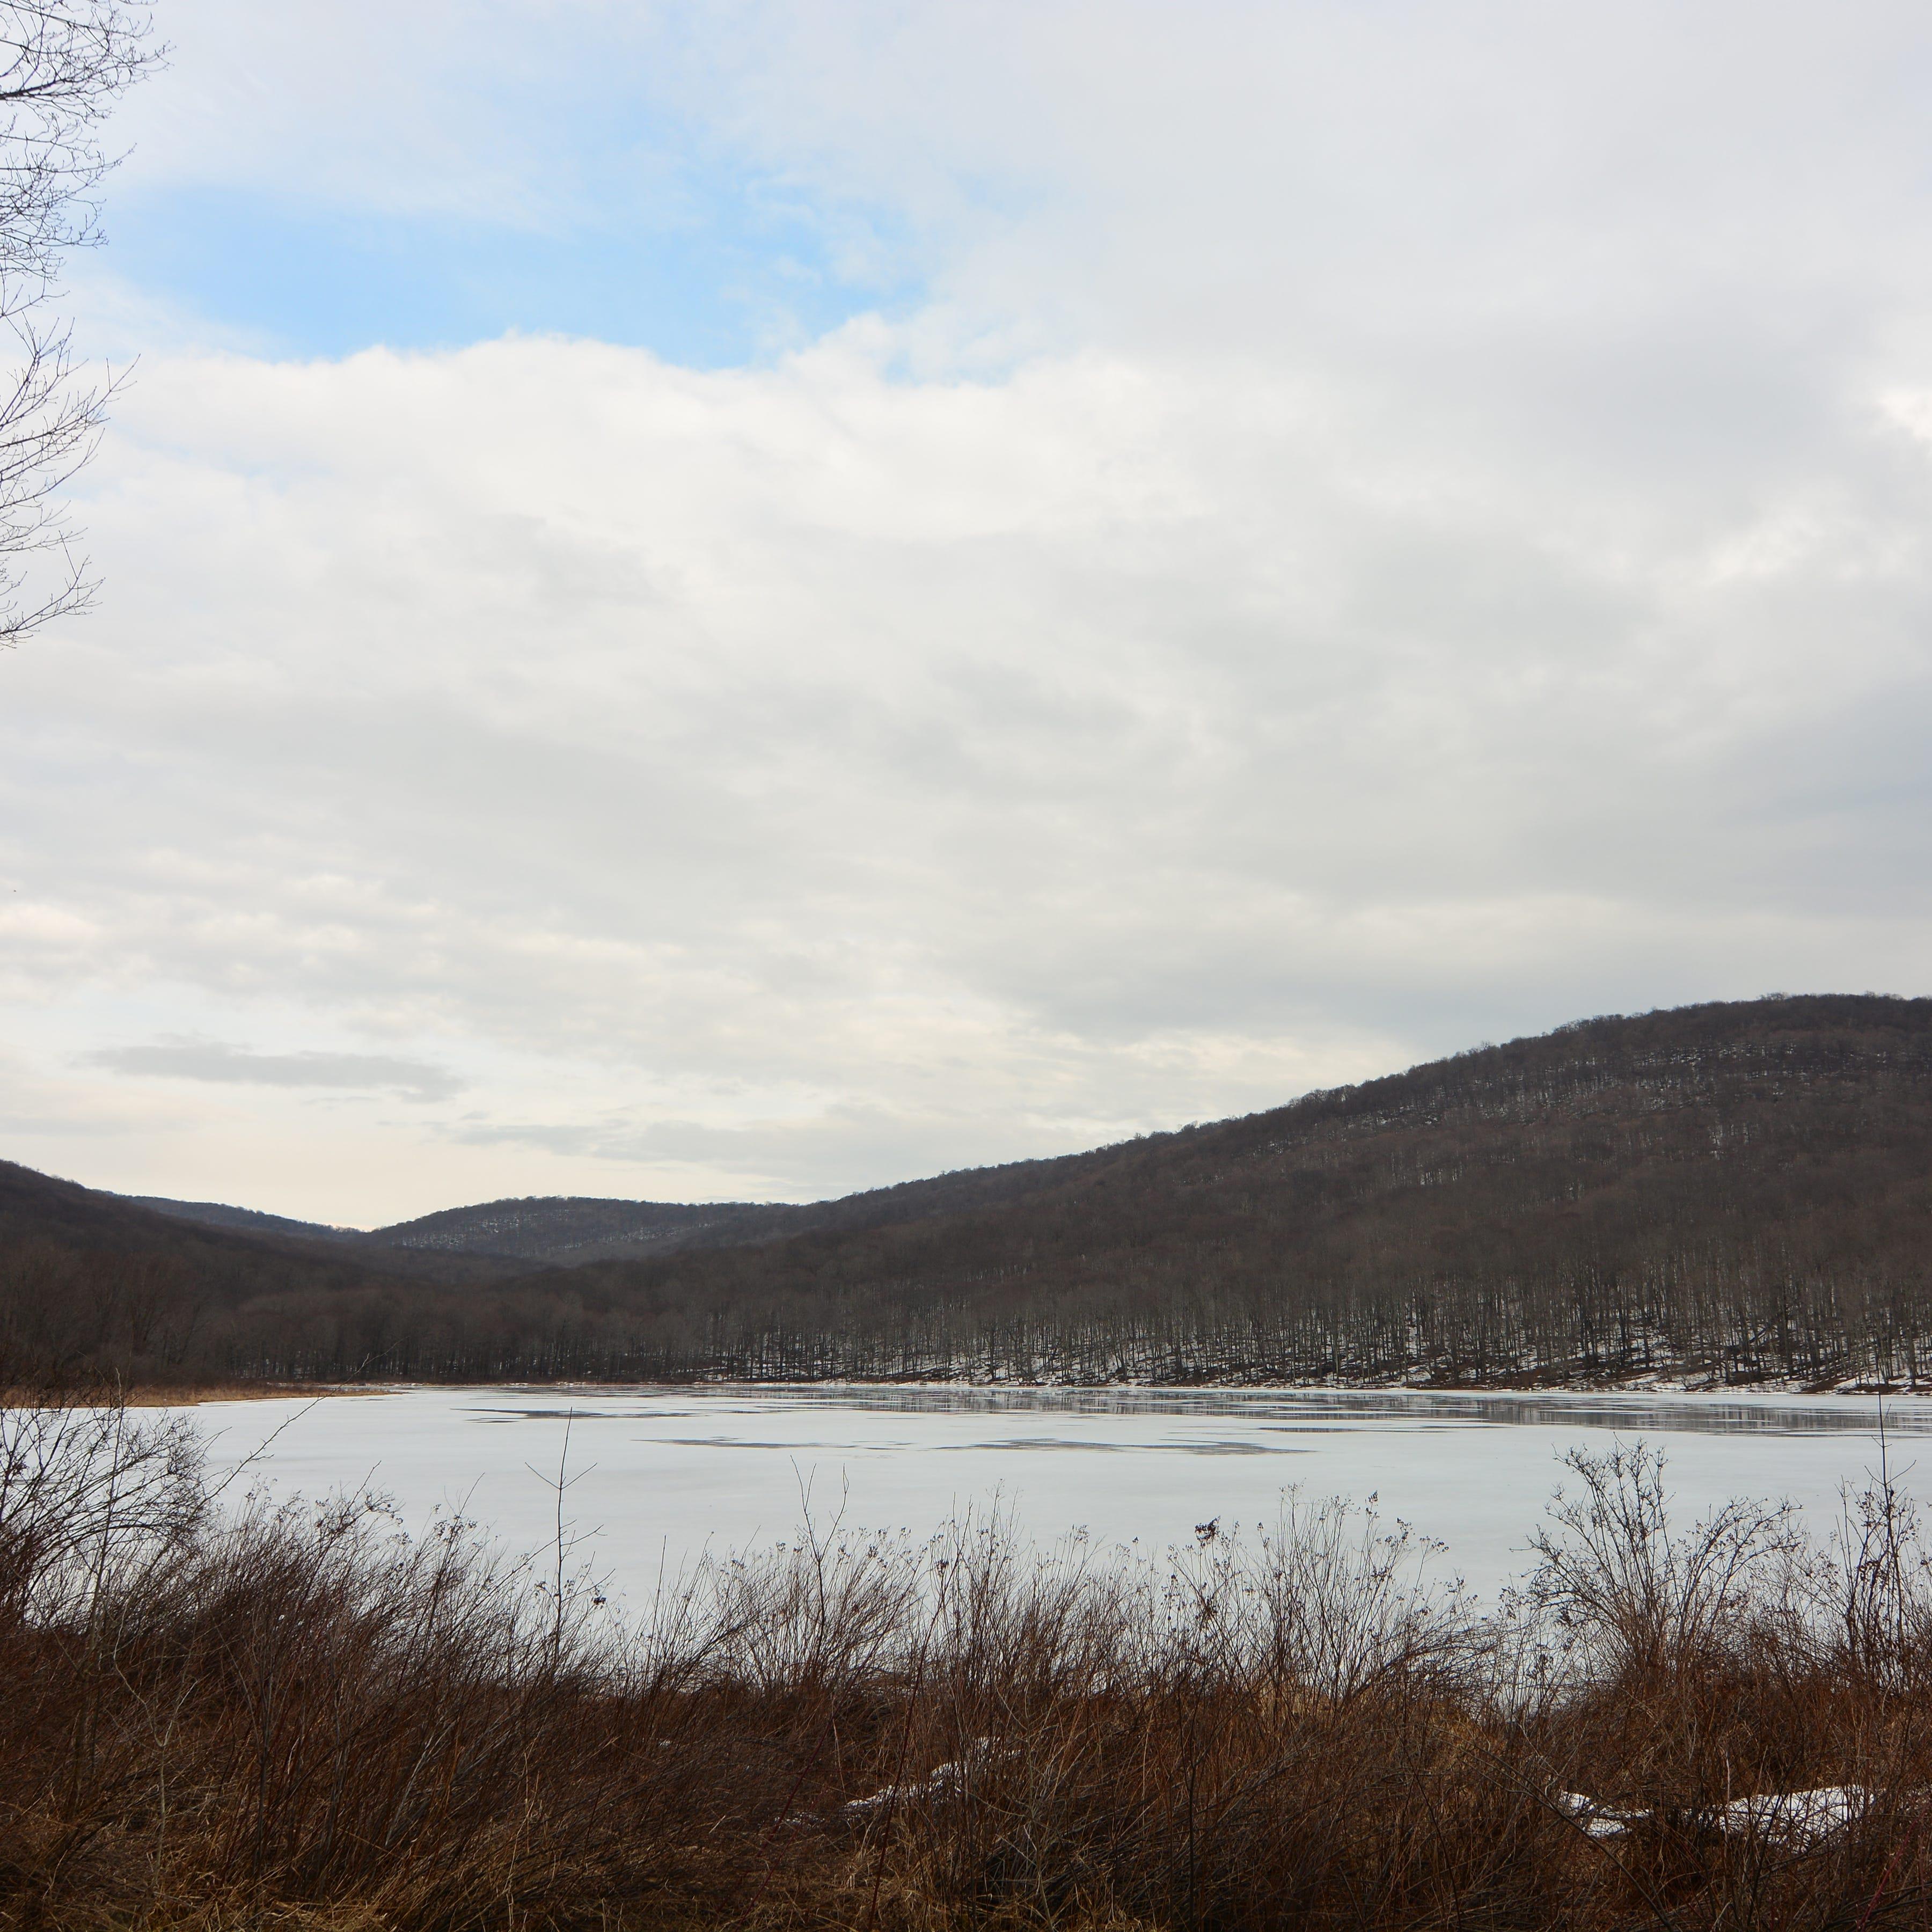 Easy hike along Alder Lake a pleasant surprise